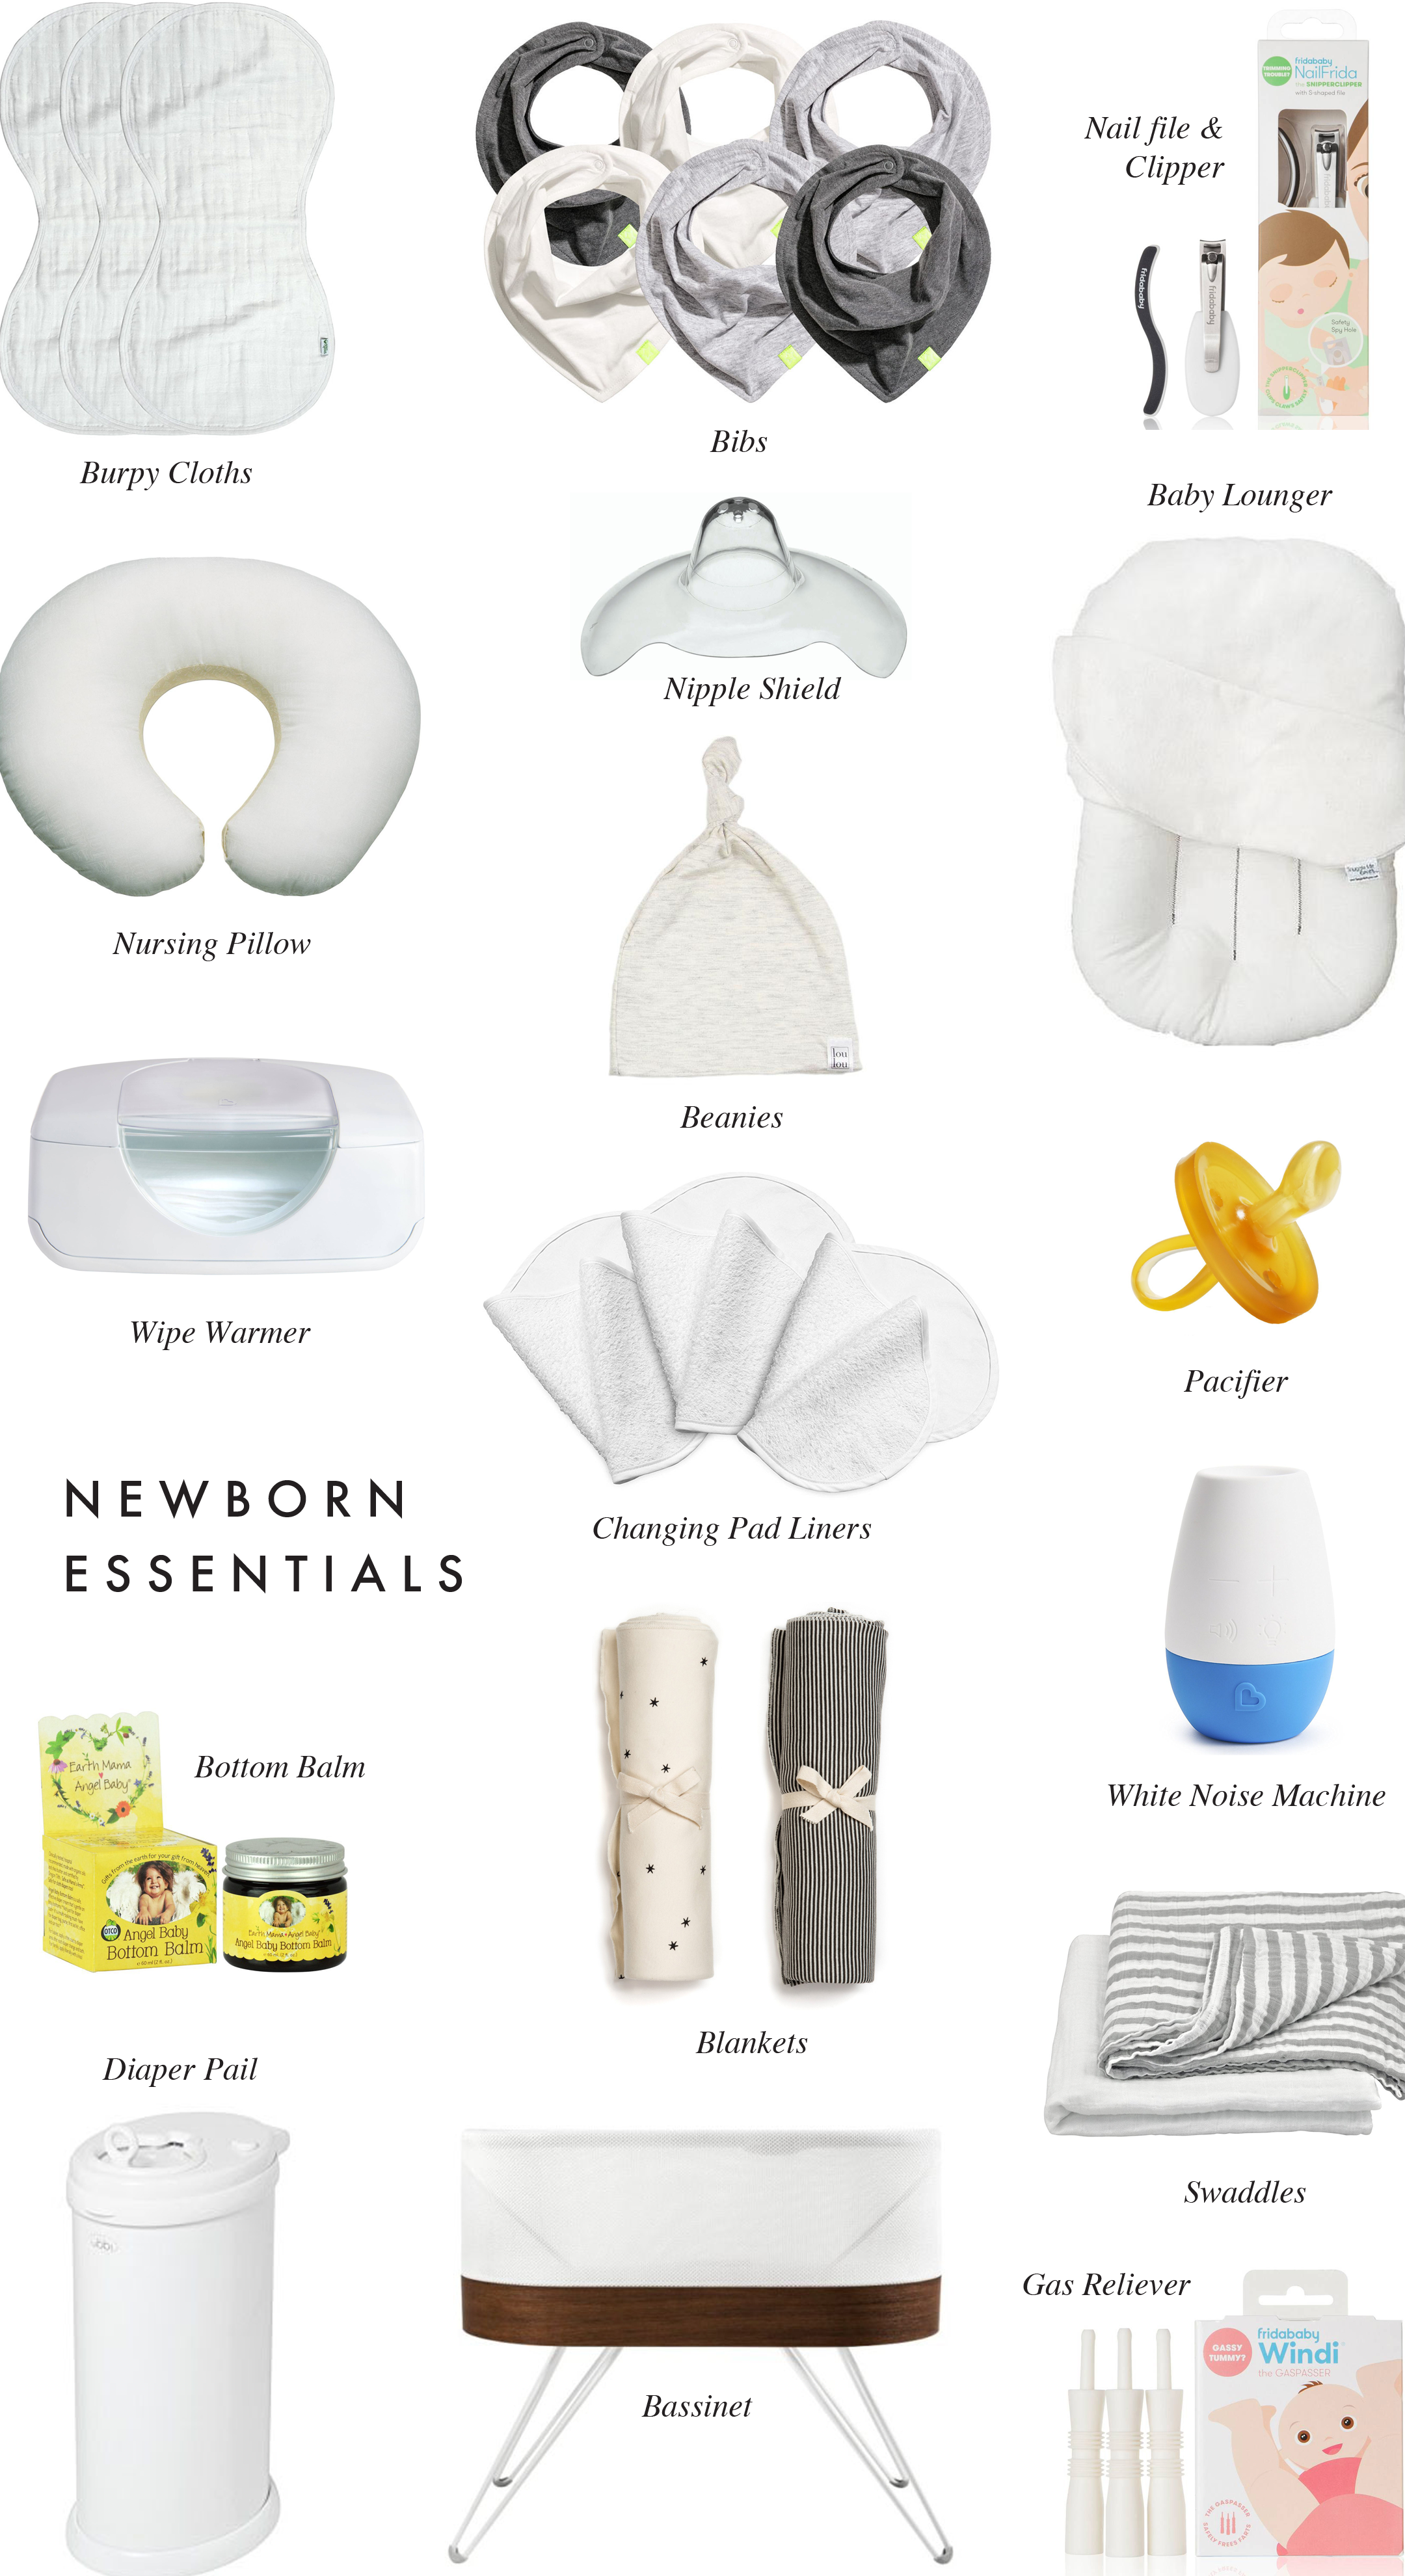 95c97cb23 My Newborn Essentials - Crystalin Marie